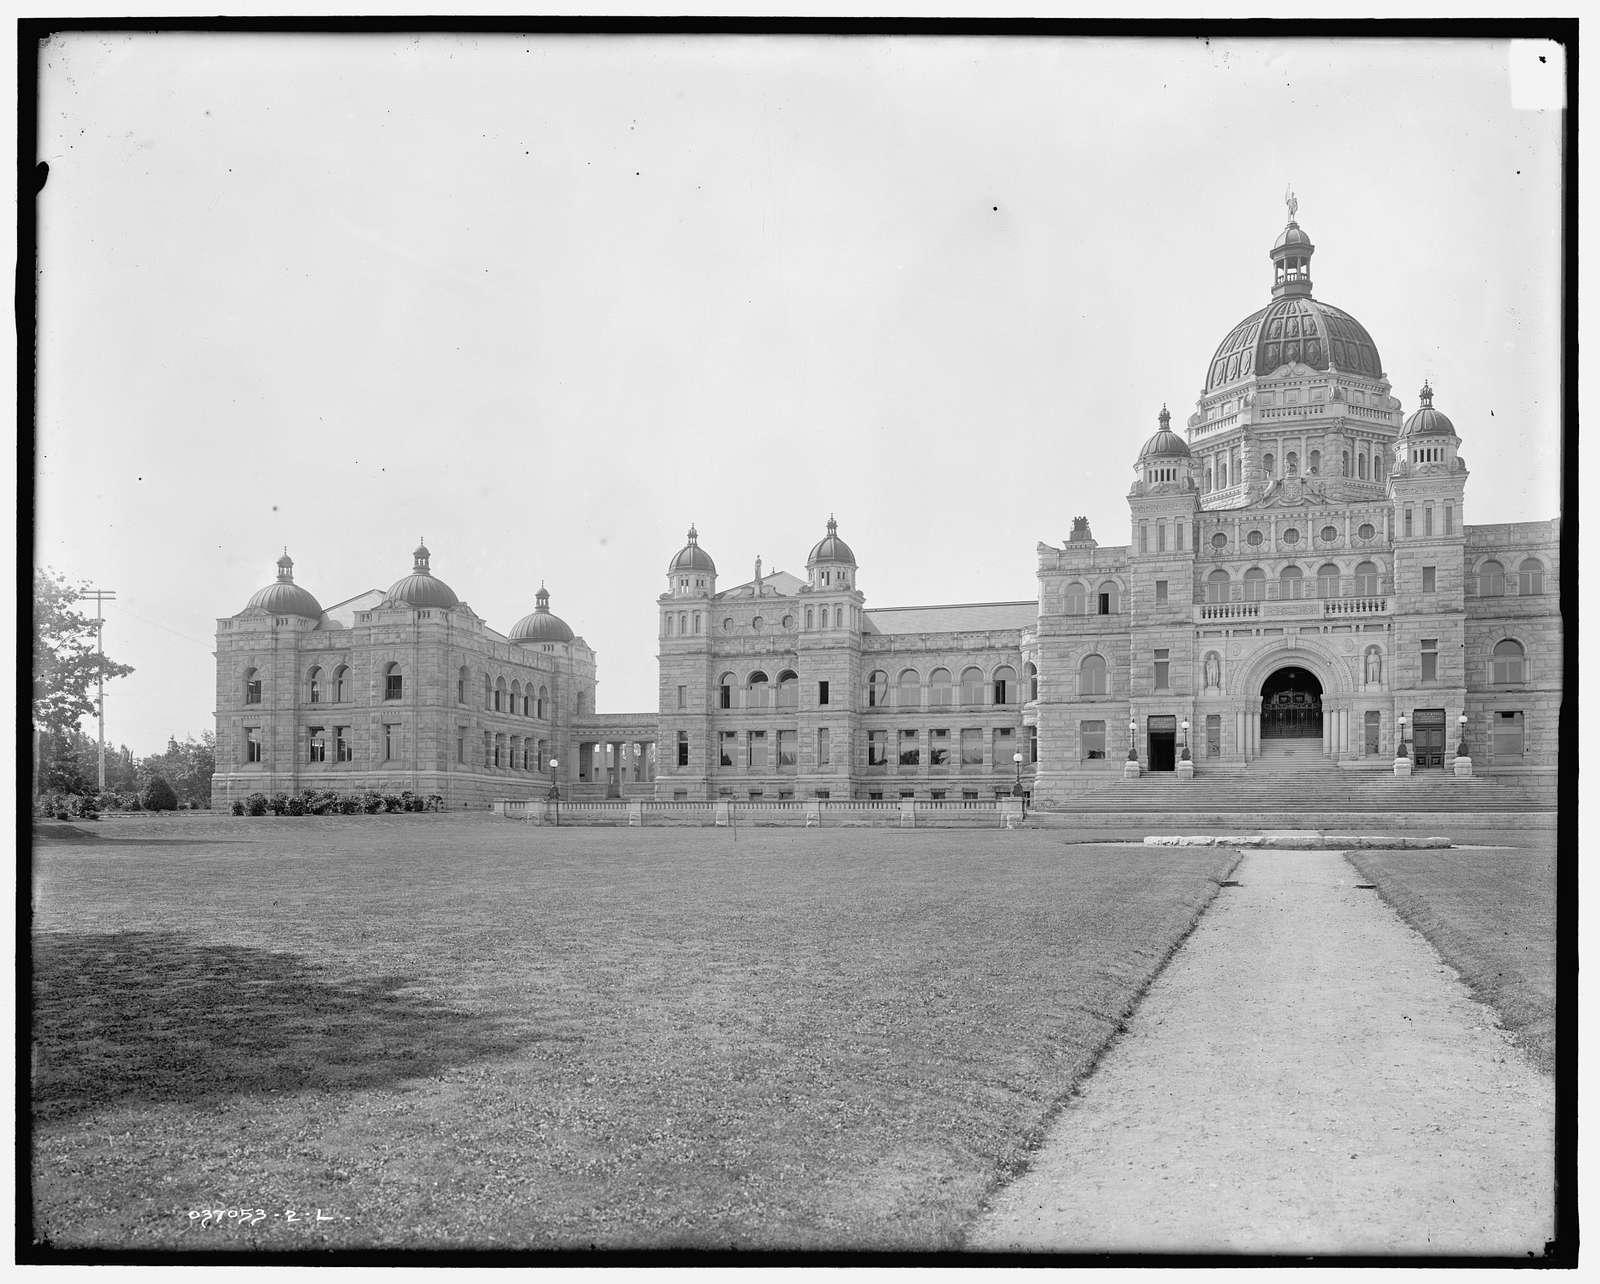 Parliament buildings, Victoria, B.C., Canada